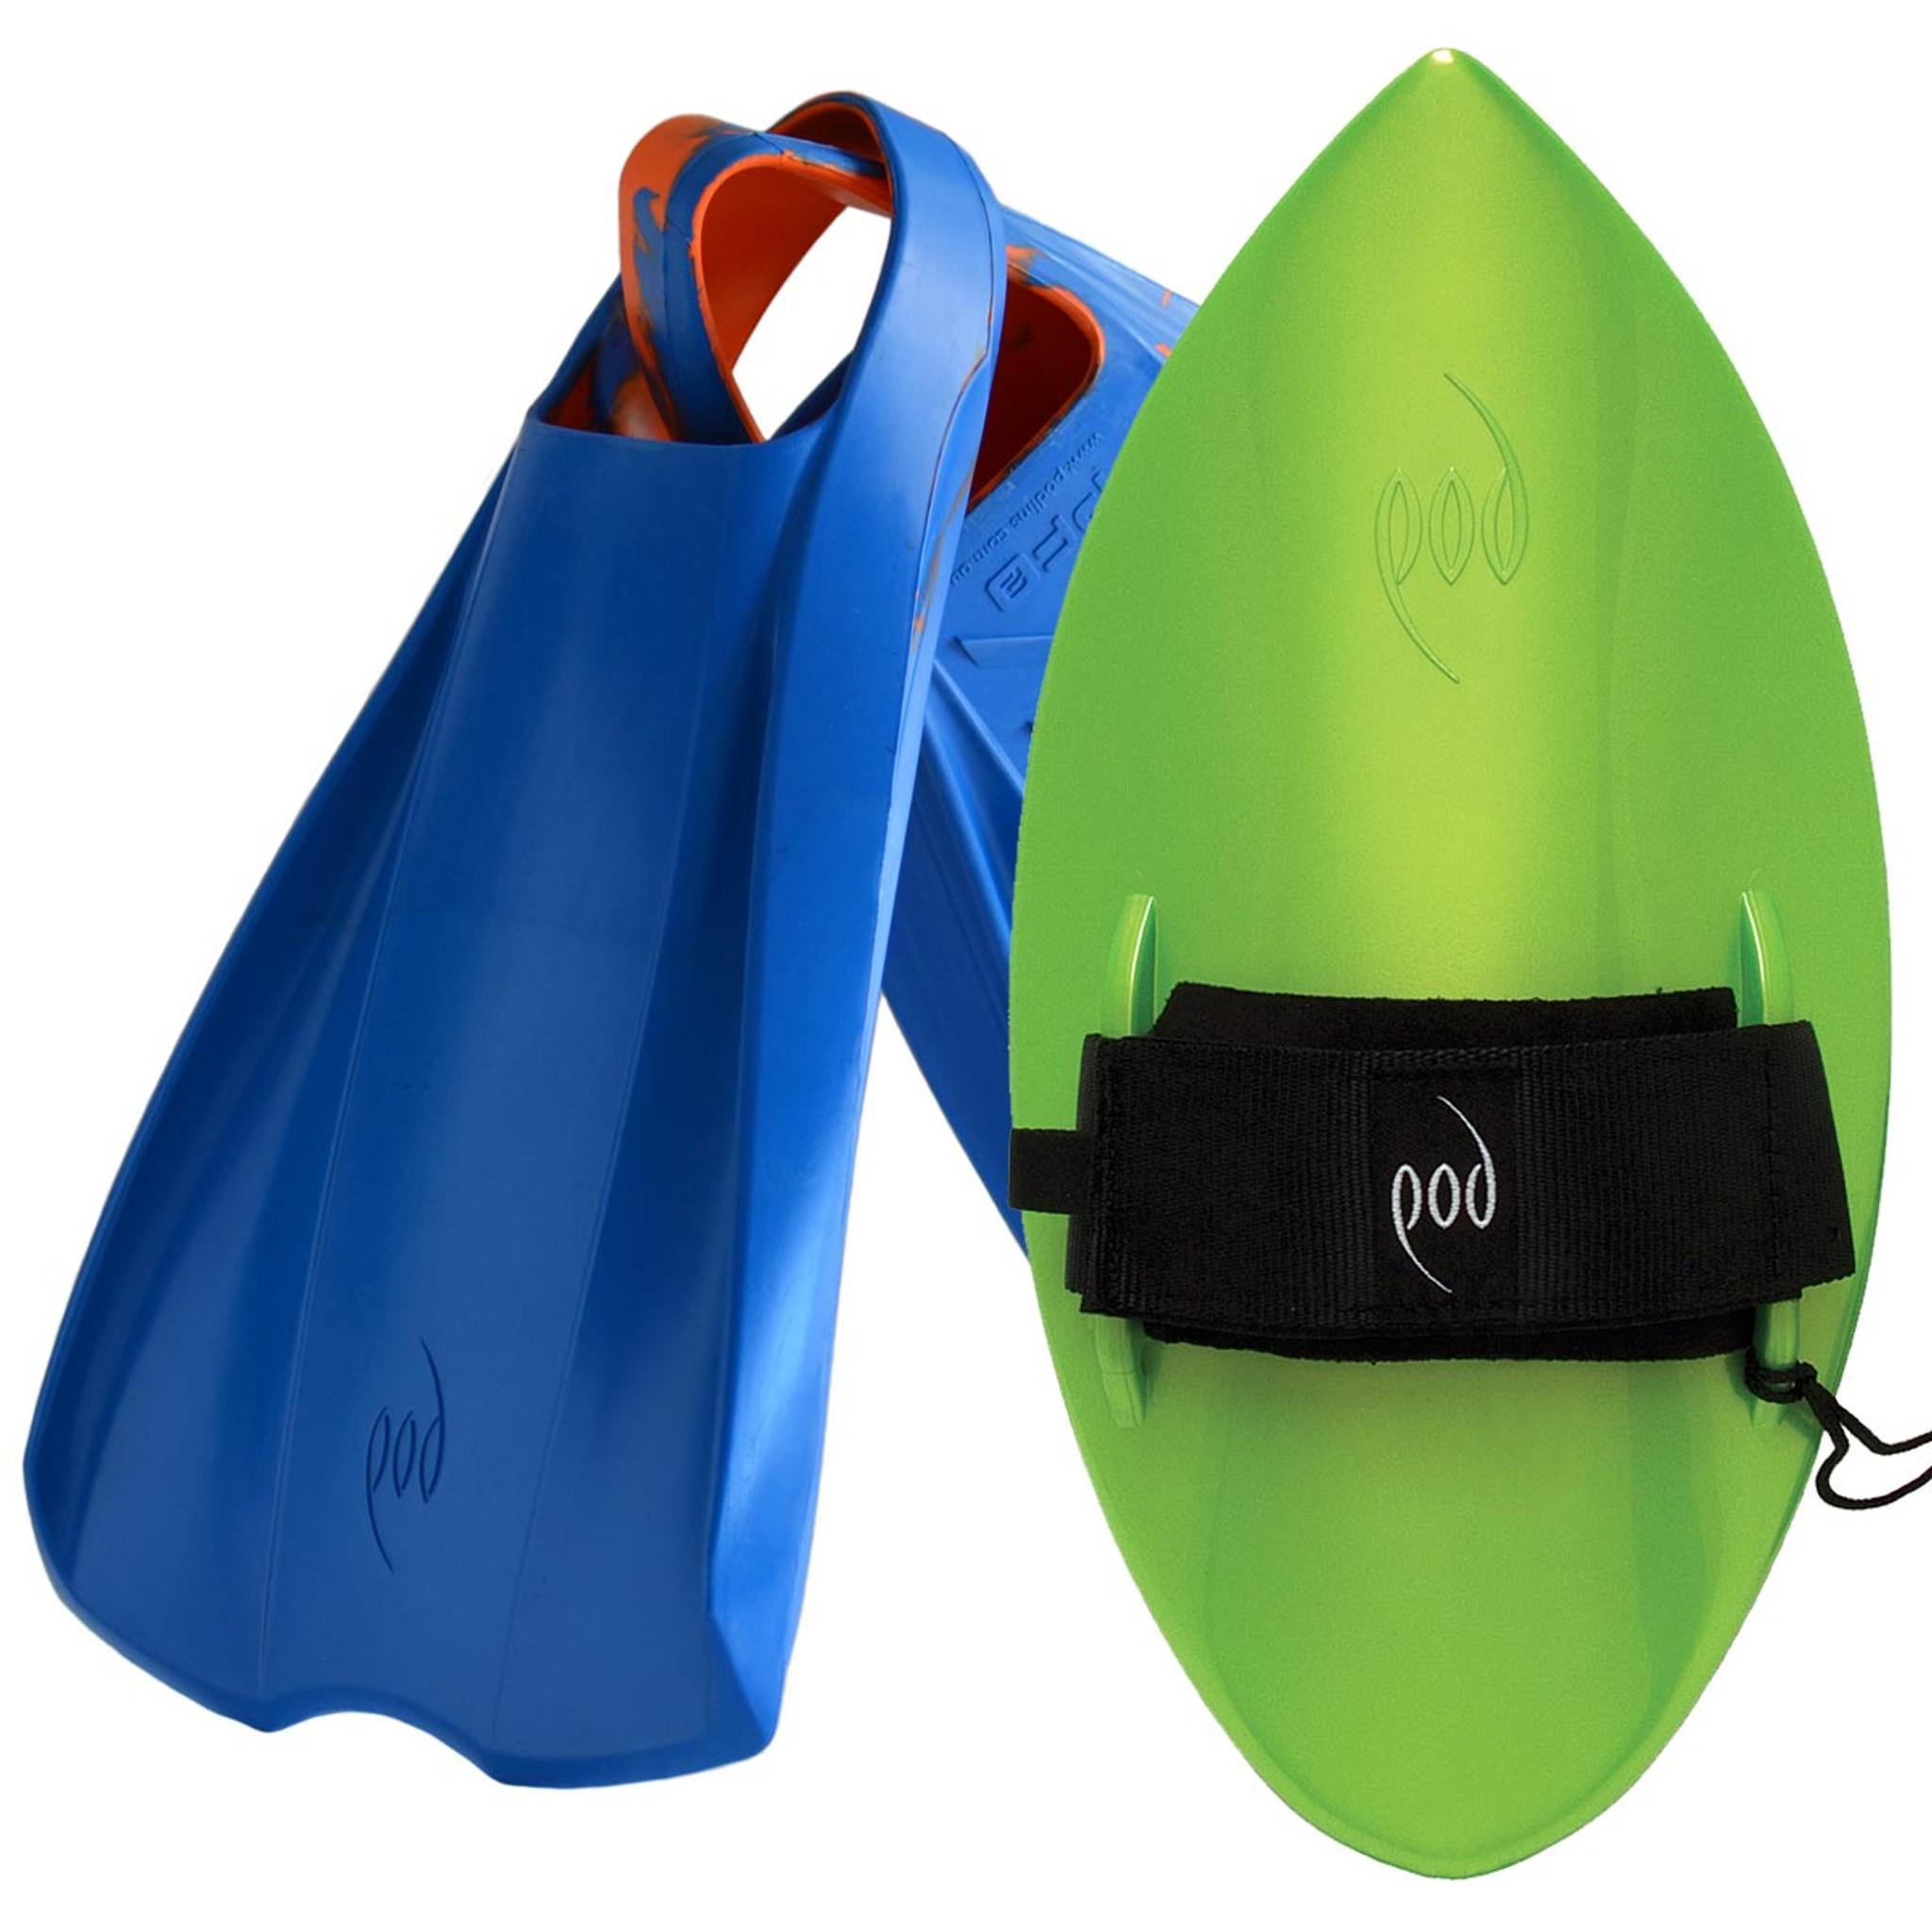 POD Fins PF2s Blue/Orange - Lime POD Handboard